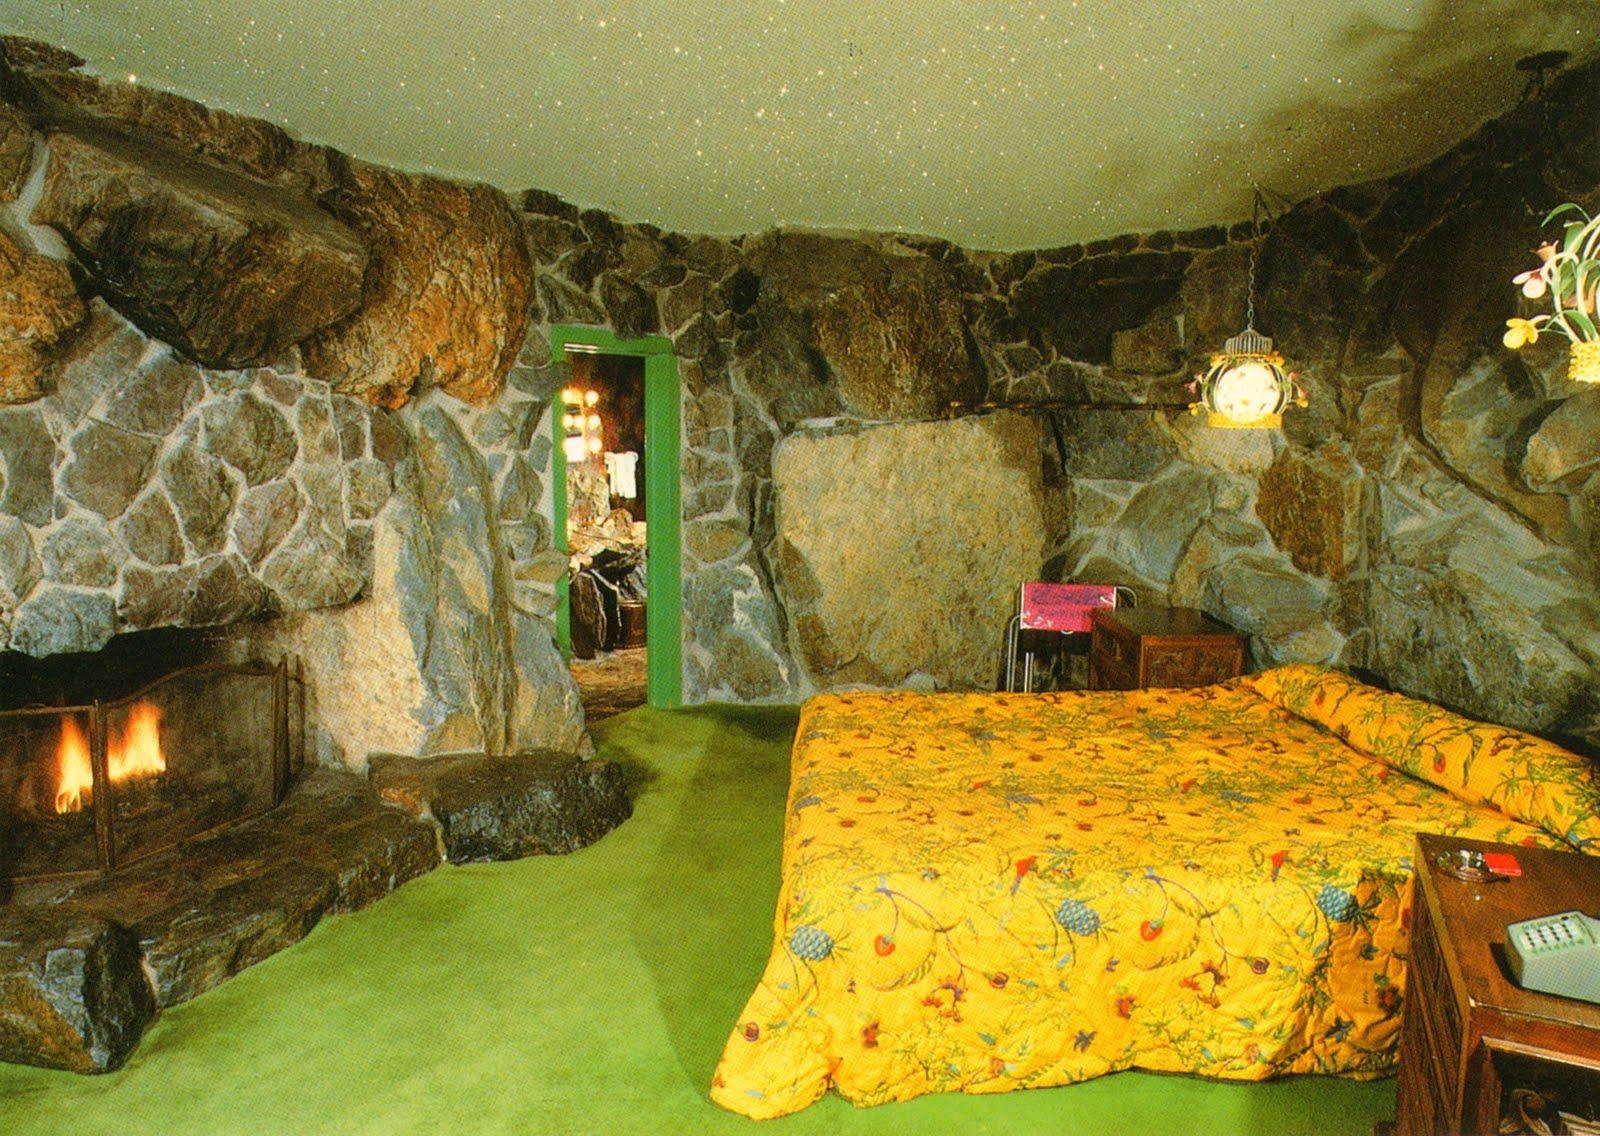 House On The Rock Inn Rooms